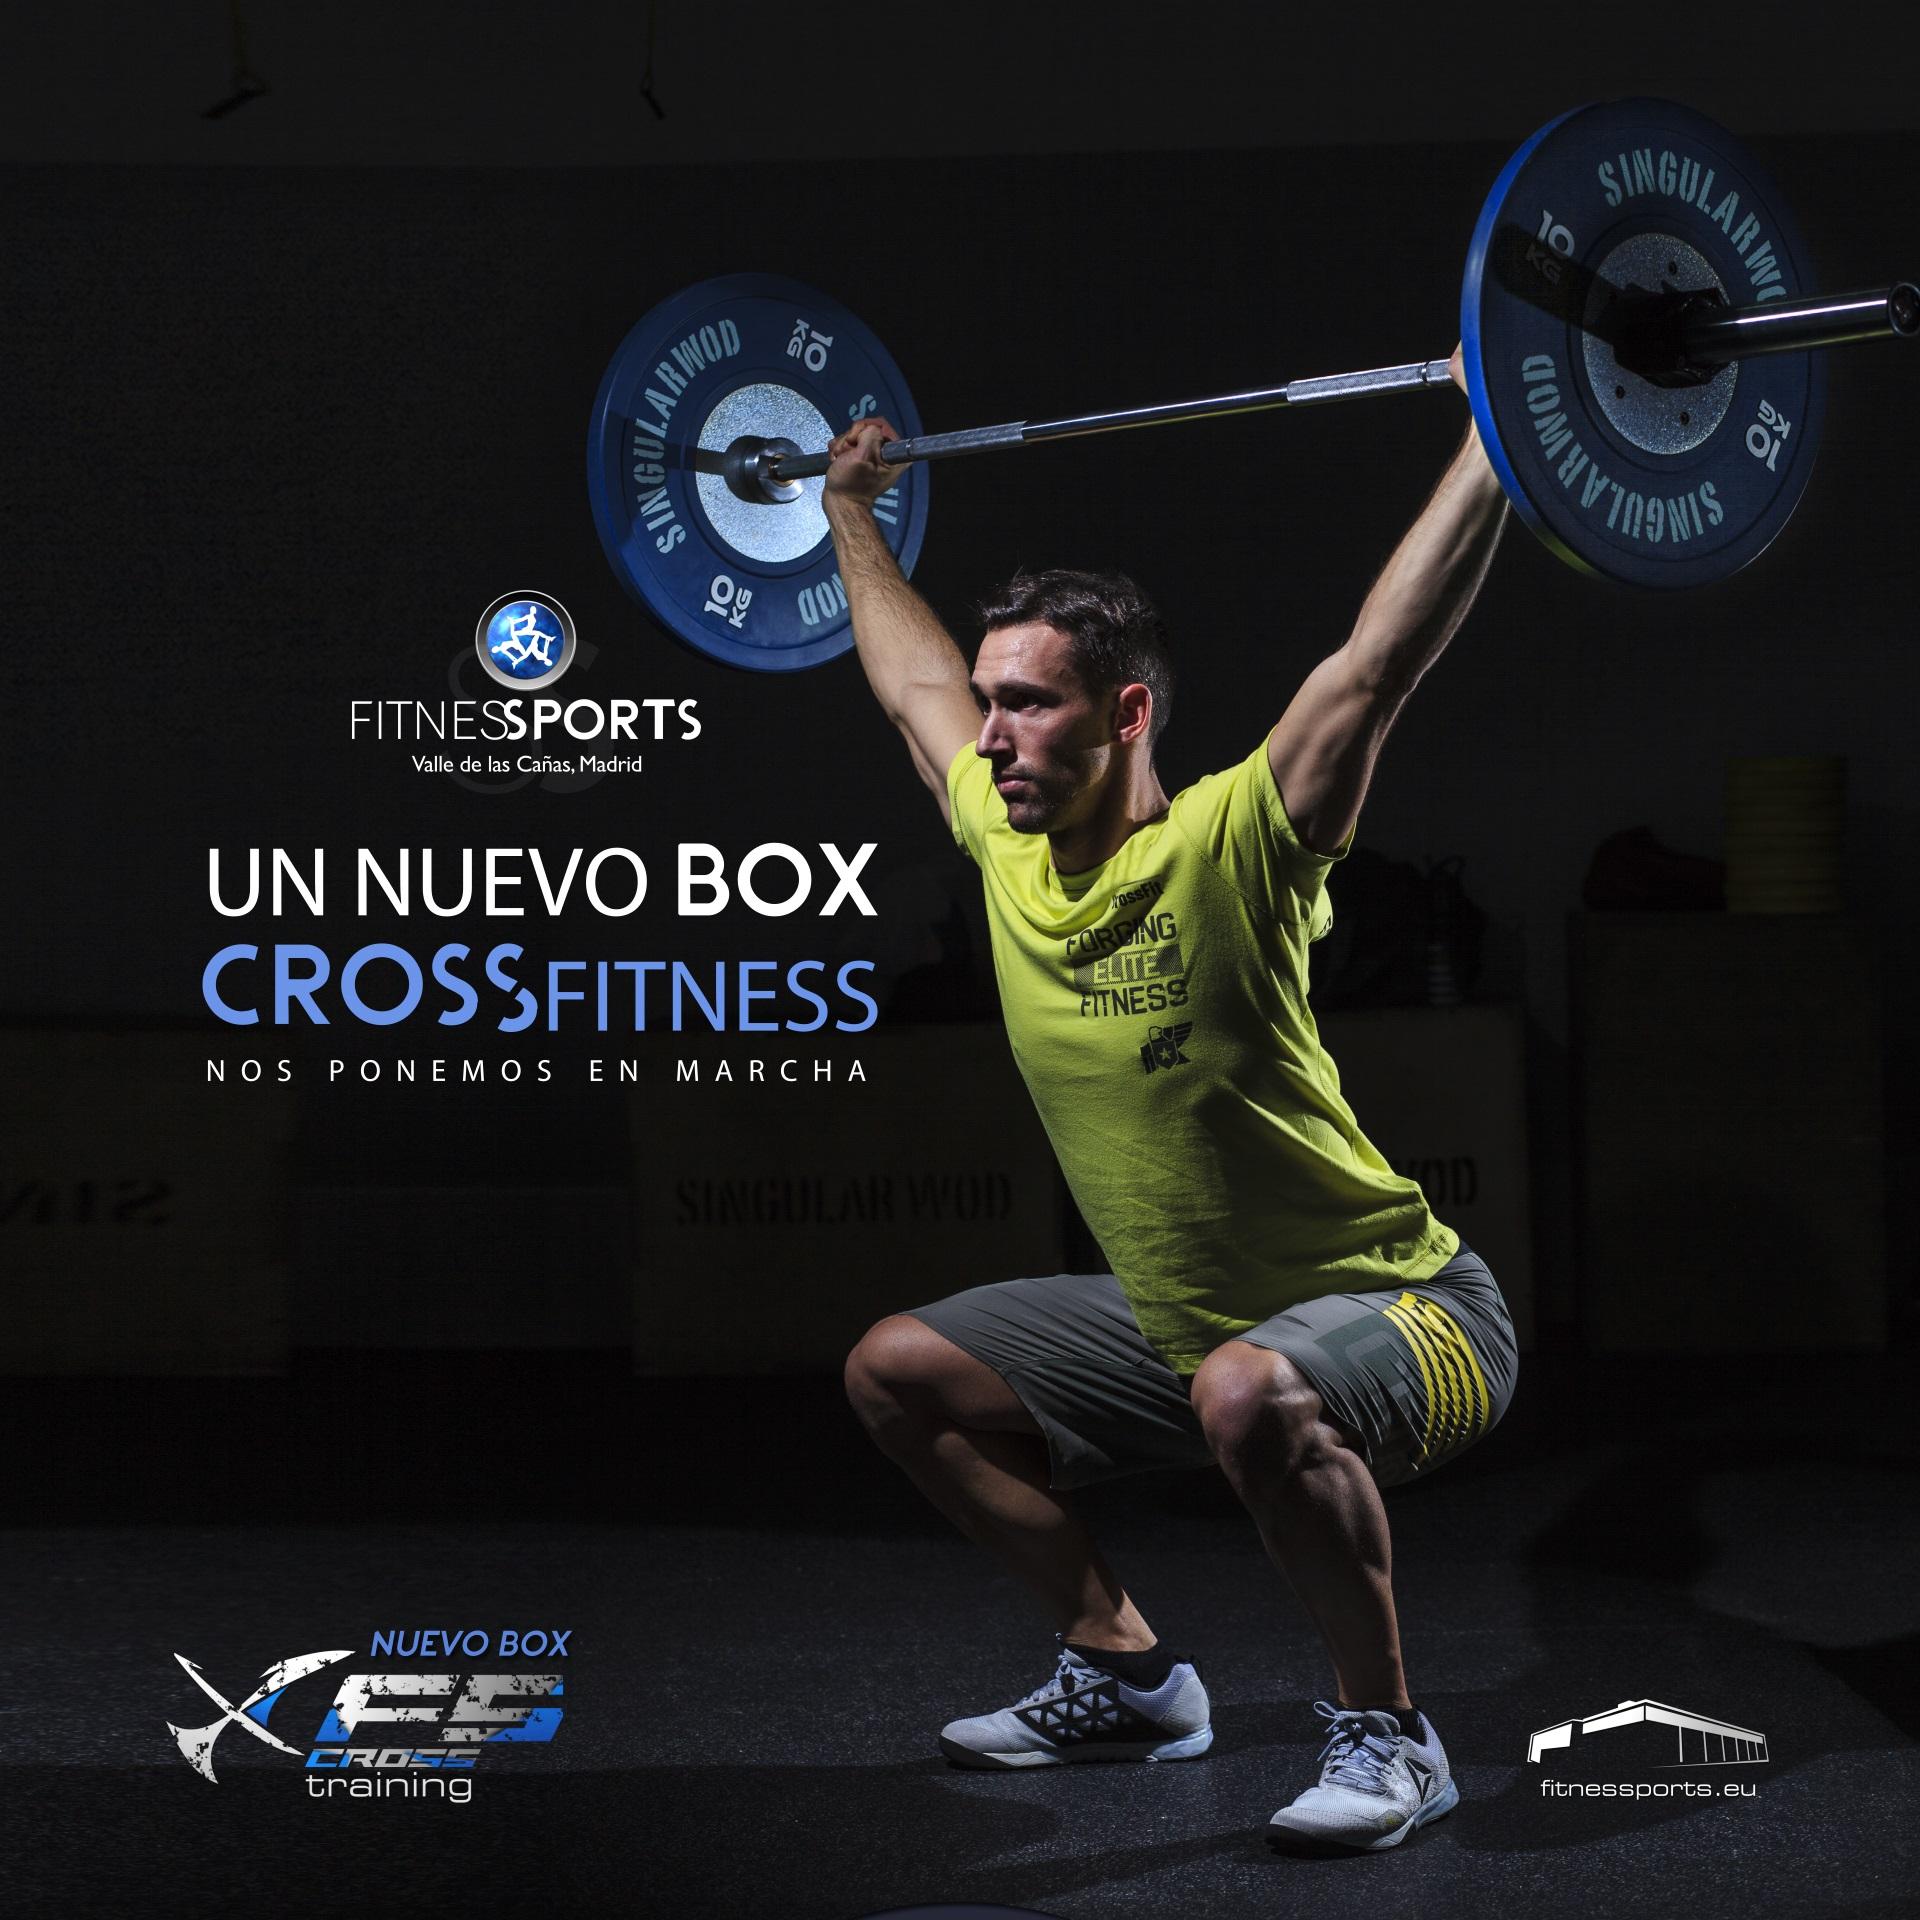 nuevo-box-fs-crossfitness-fitness-sports-valle-de-las-canas